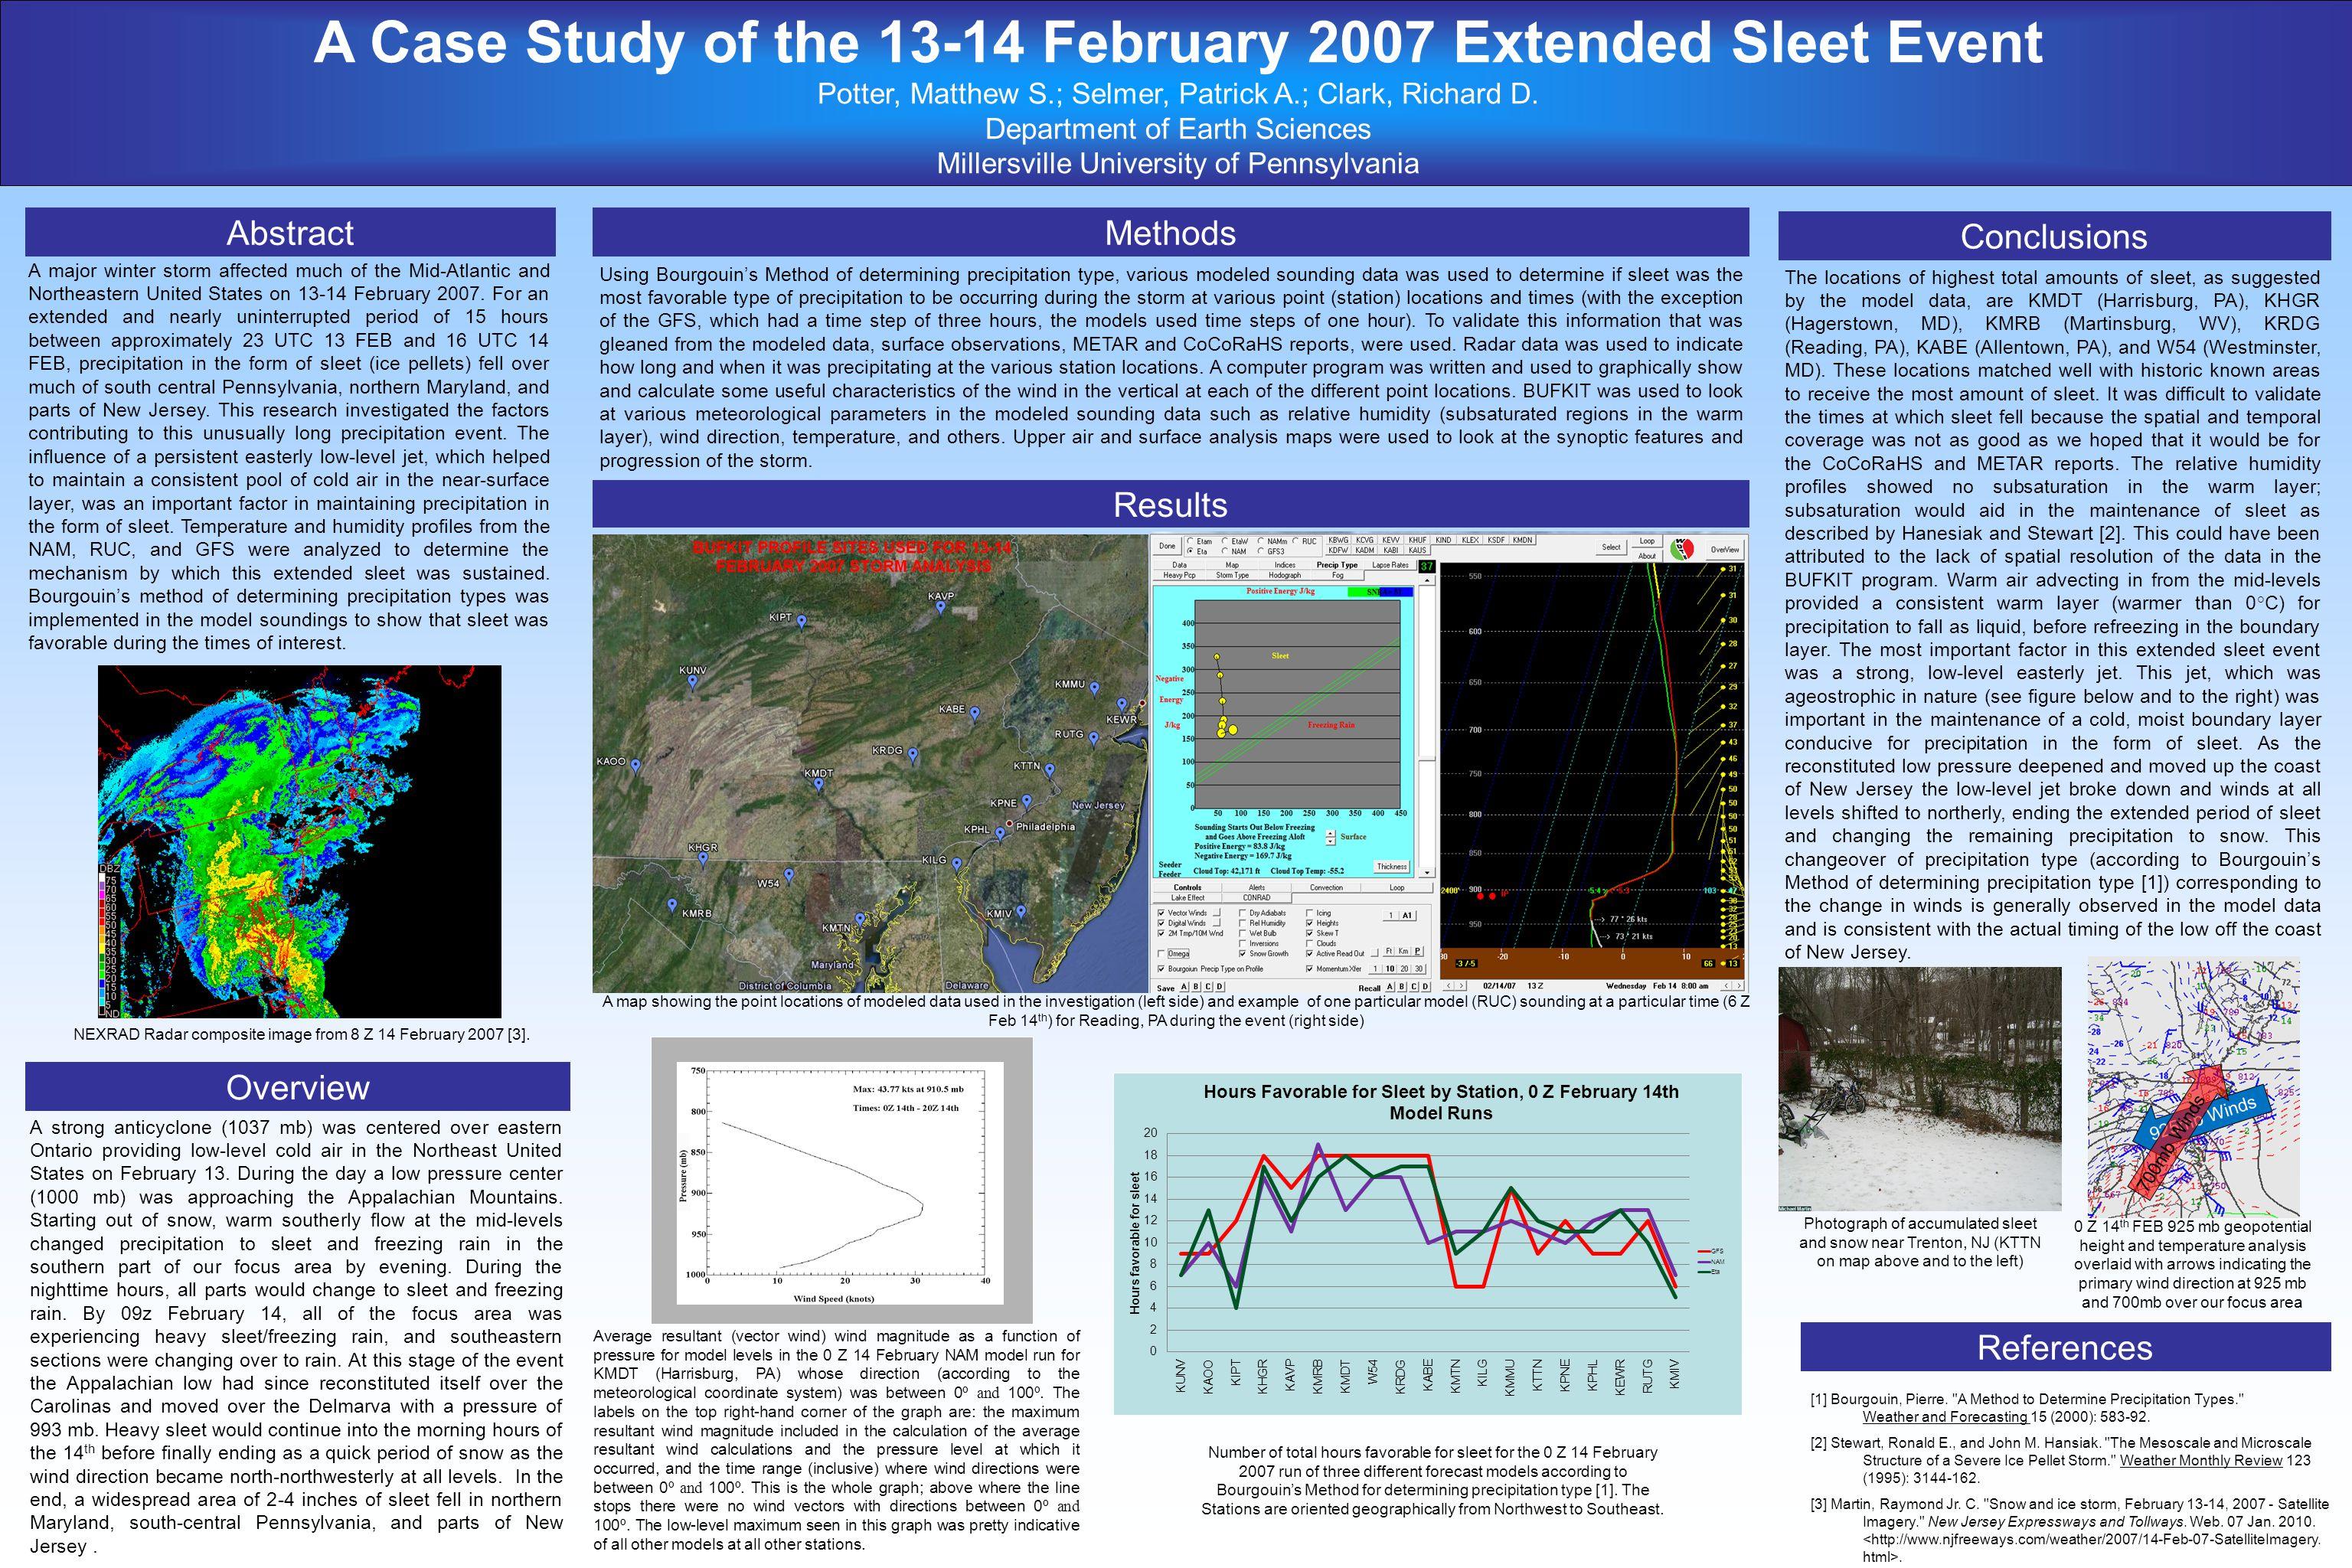 A Case Study of the 13-14 February 2007 Extended Sleet Event Potter, Matthew S.; Selmer, Patrick A.; Clark, Richard D.